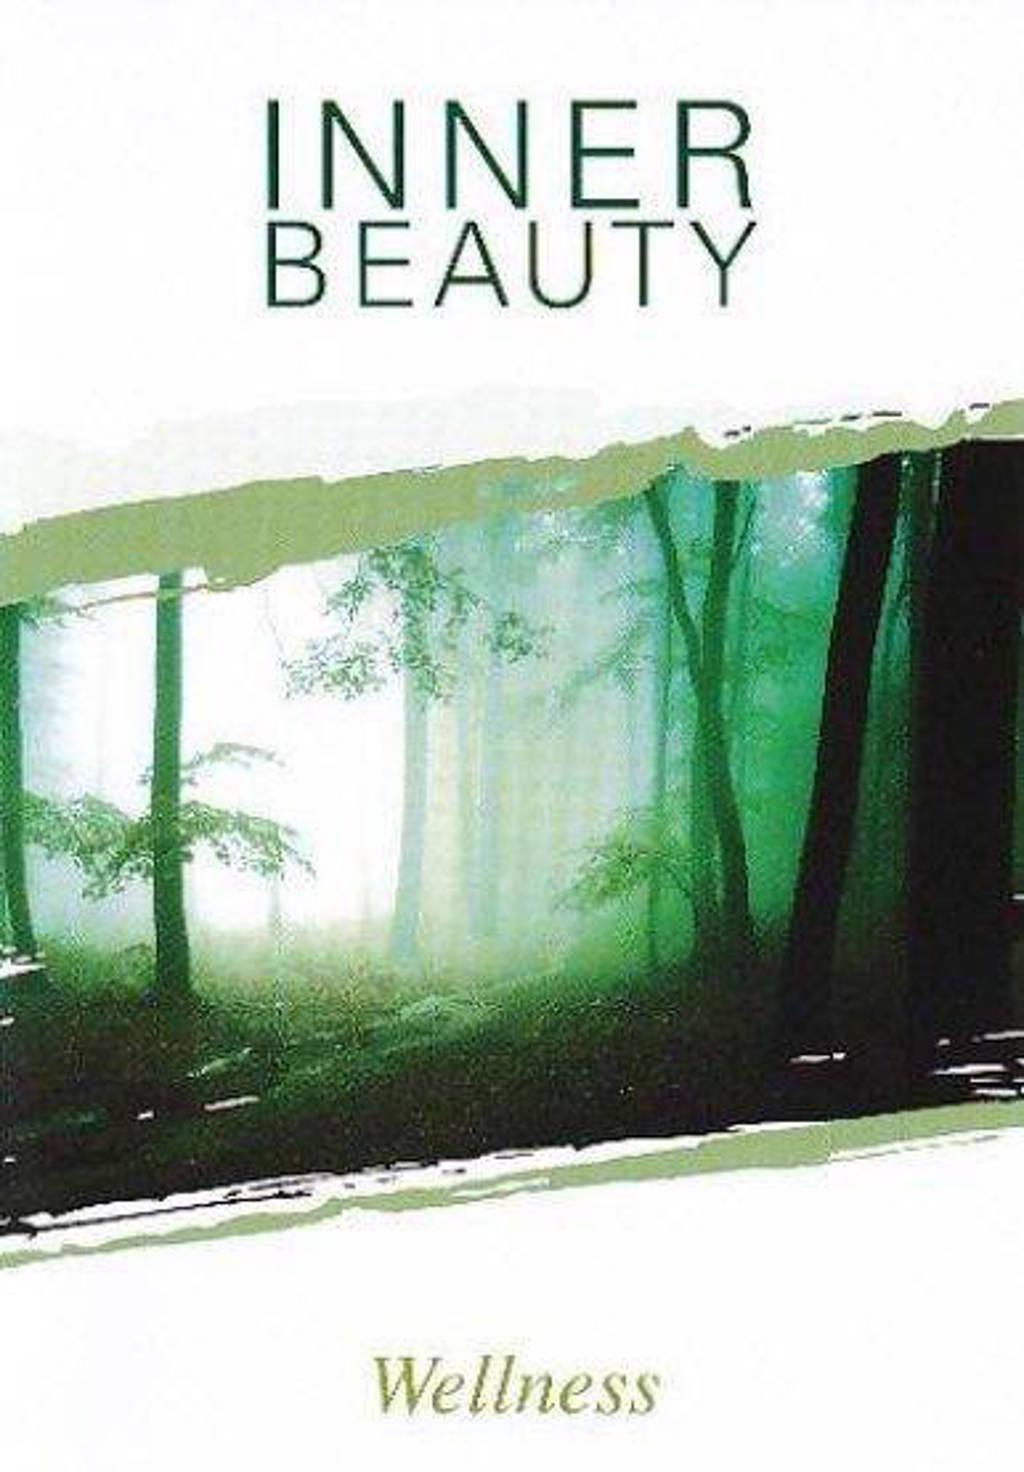 Welness - Inner beauty (DVD)